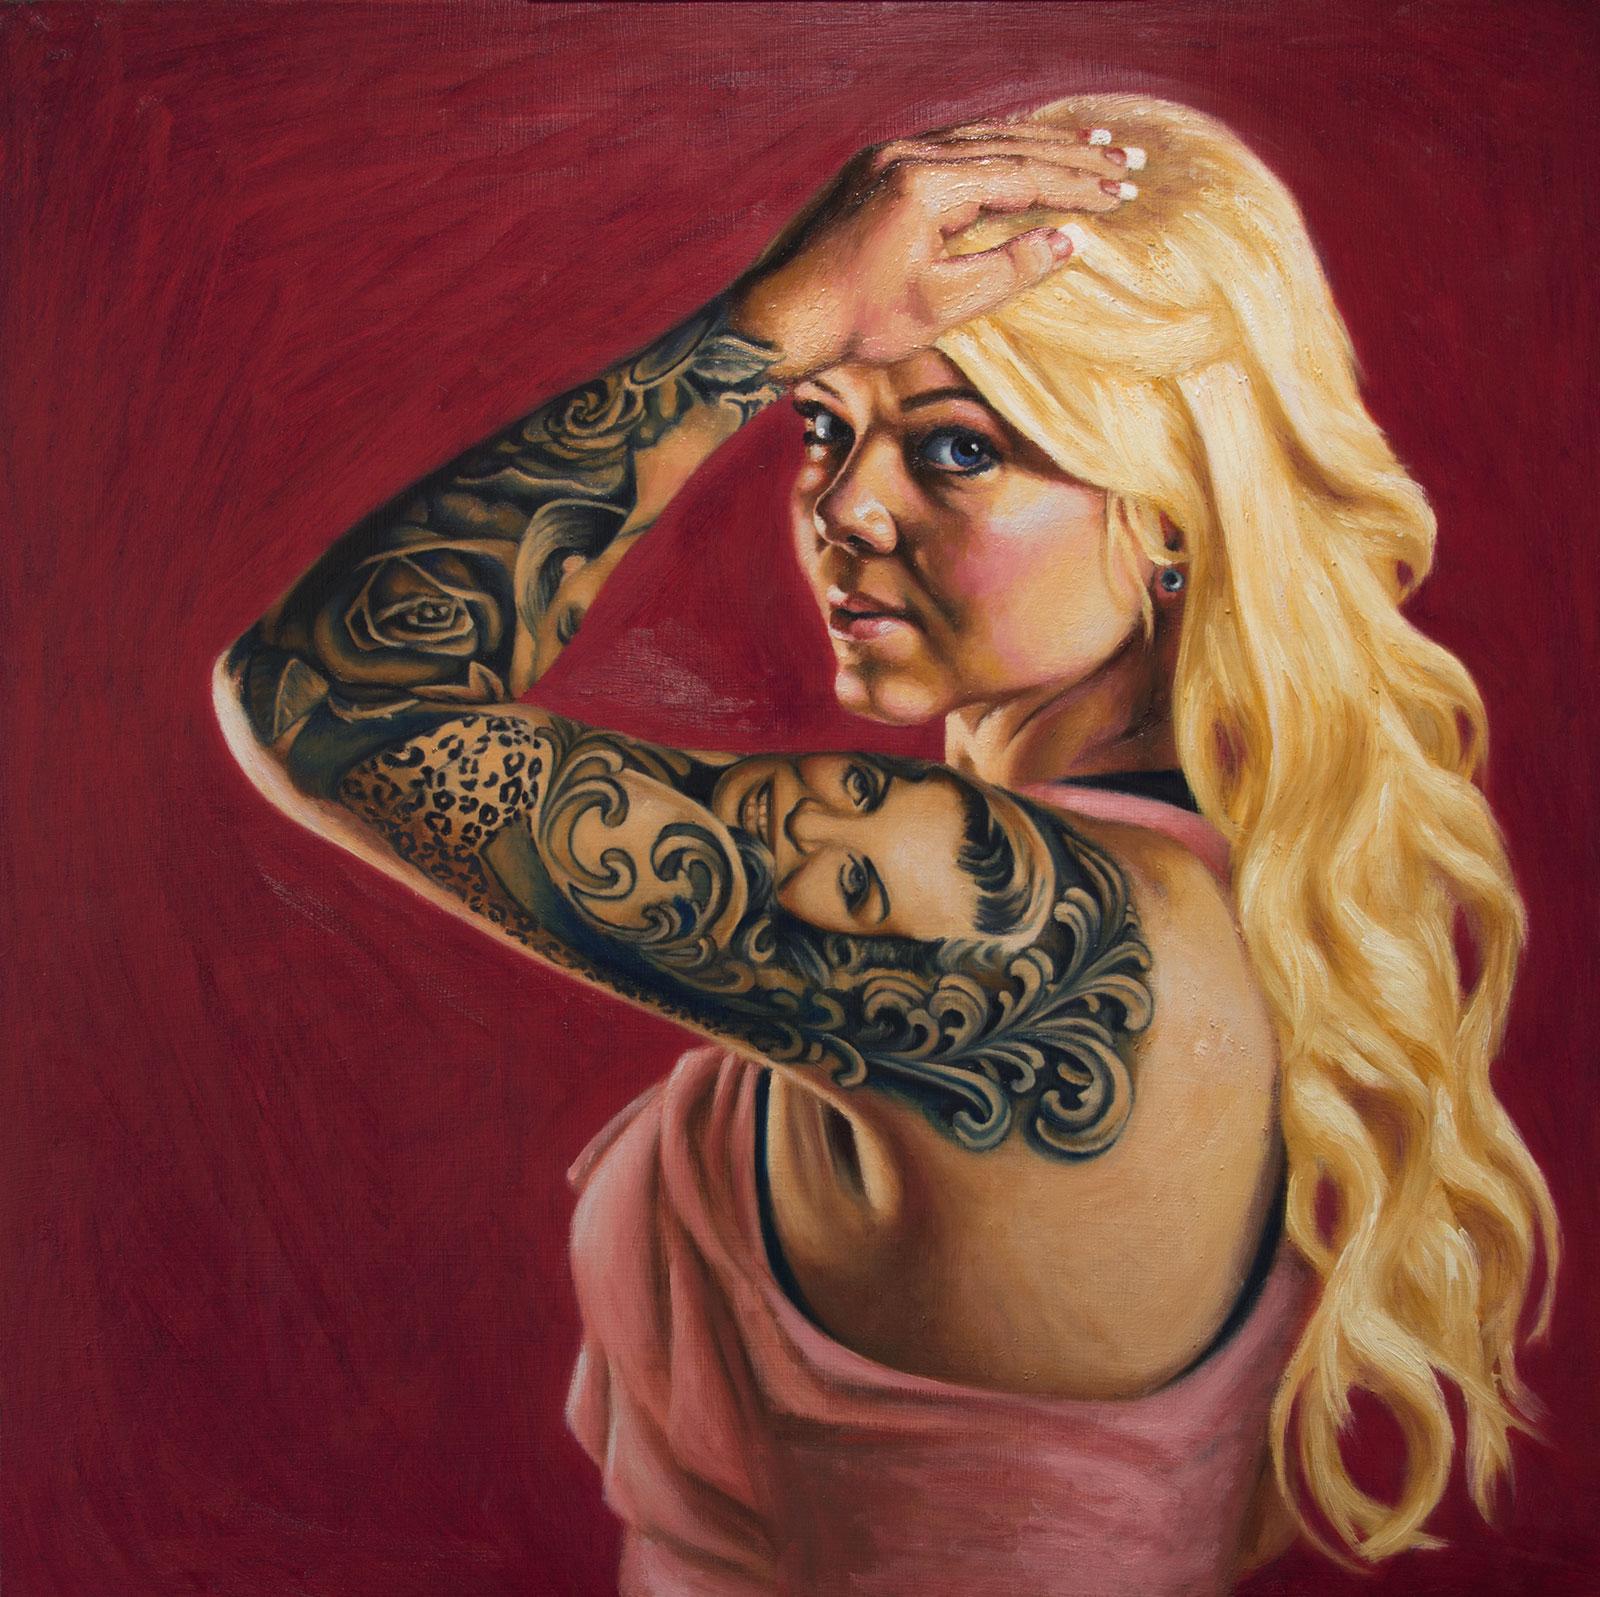 Portrait of Kayti - Jeremy C. Sparks